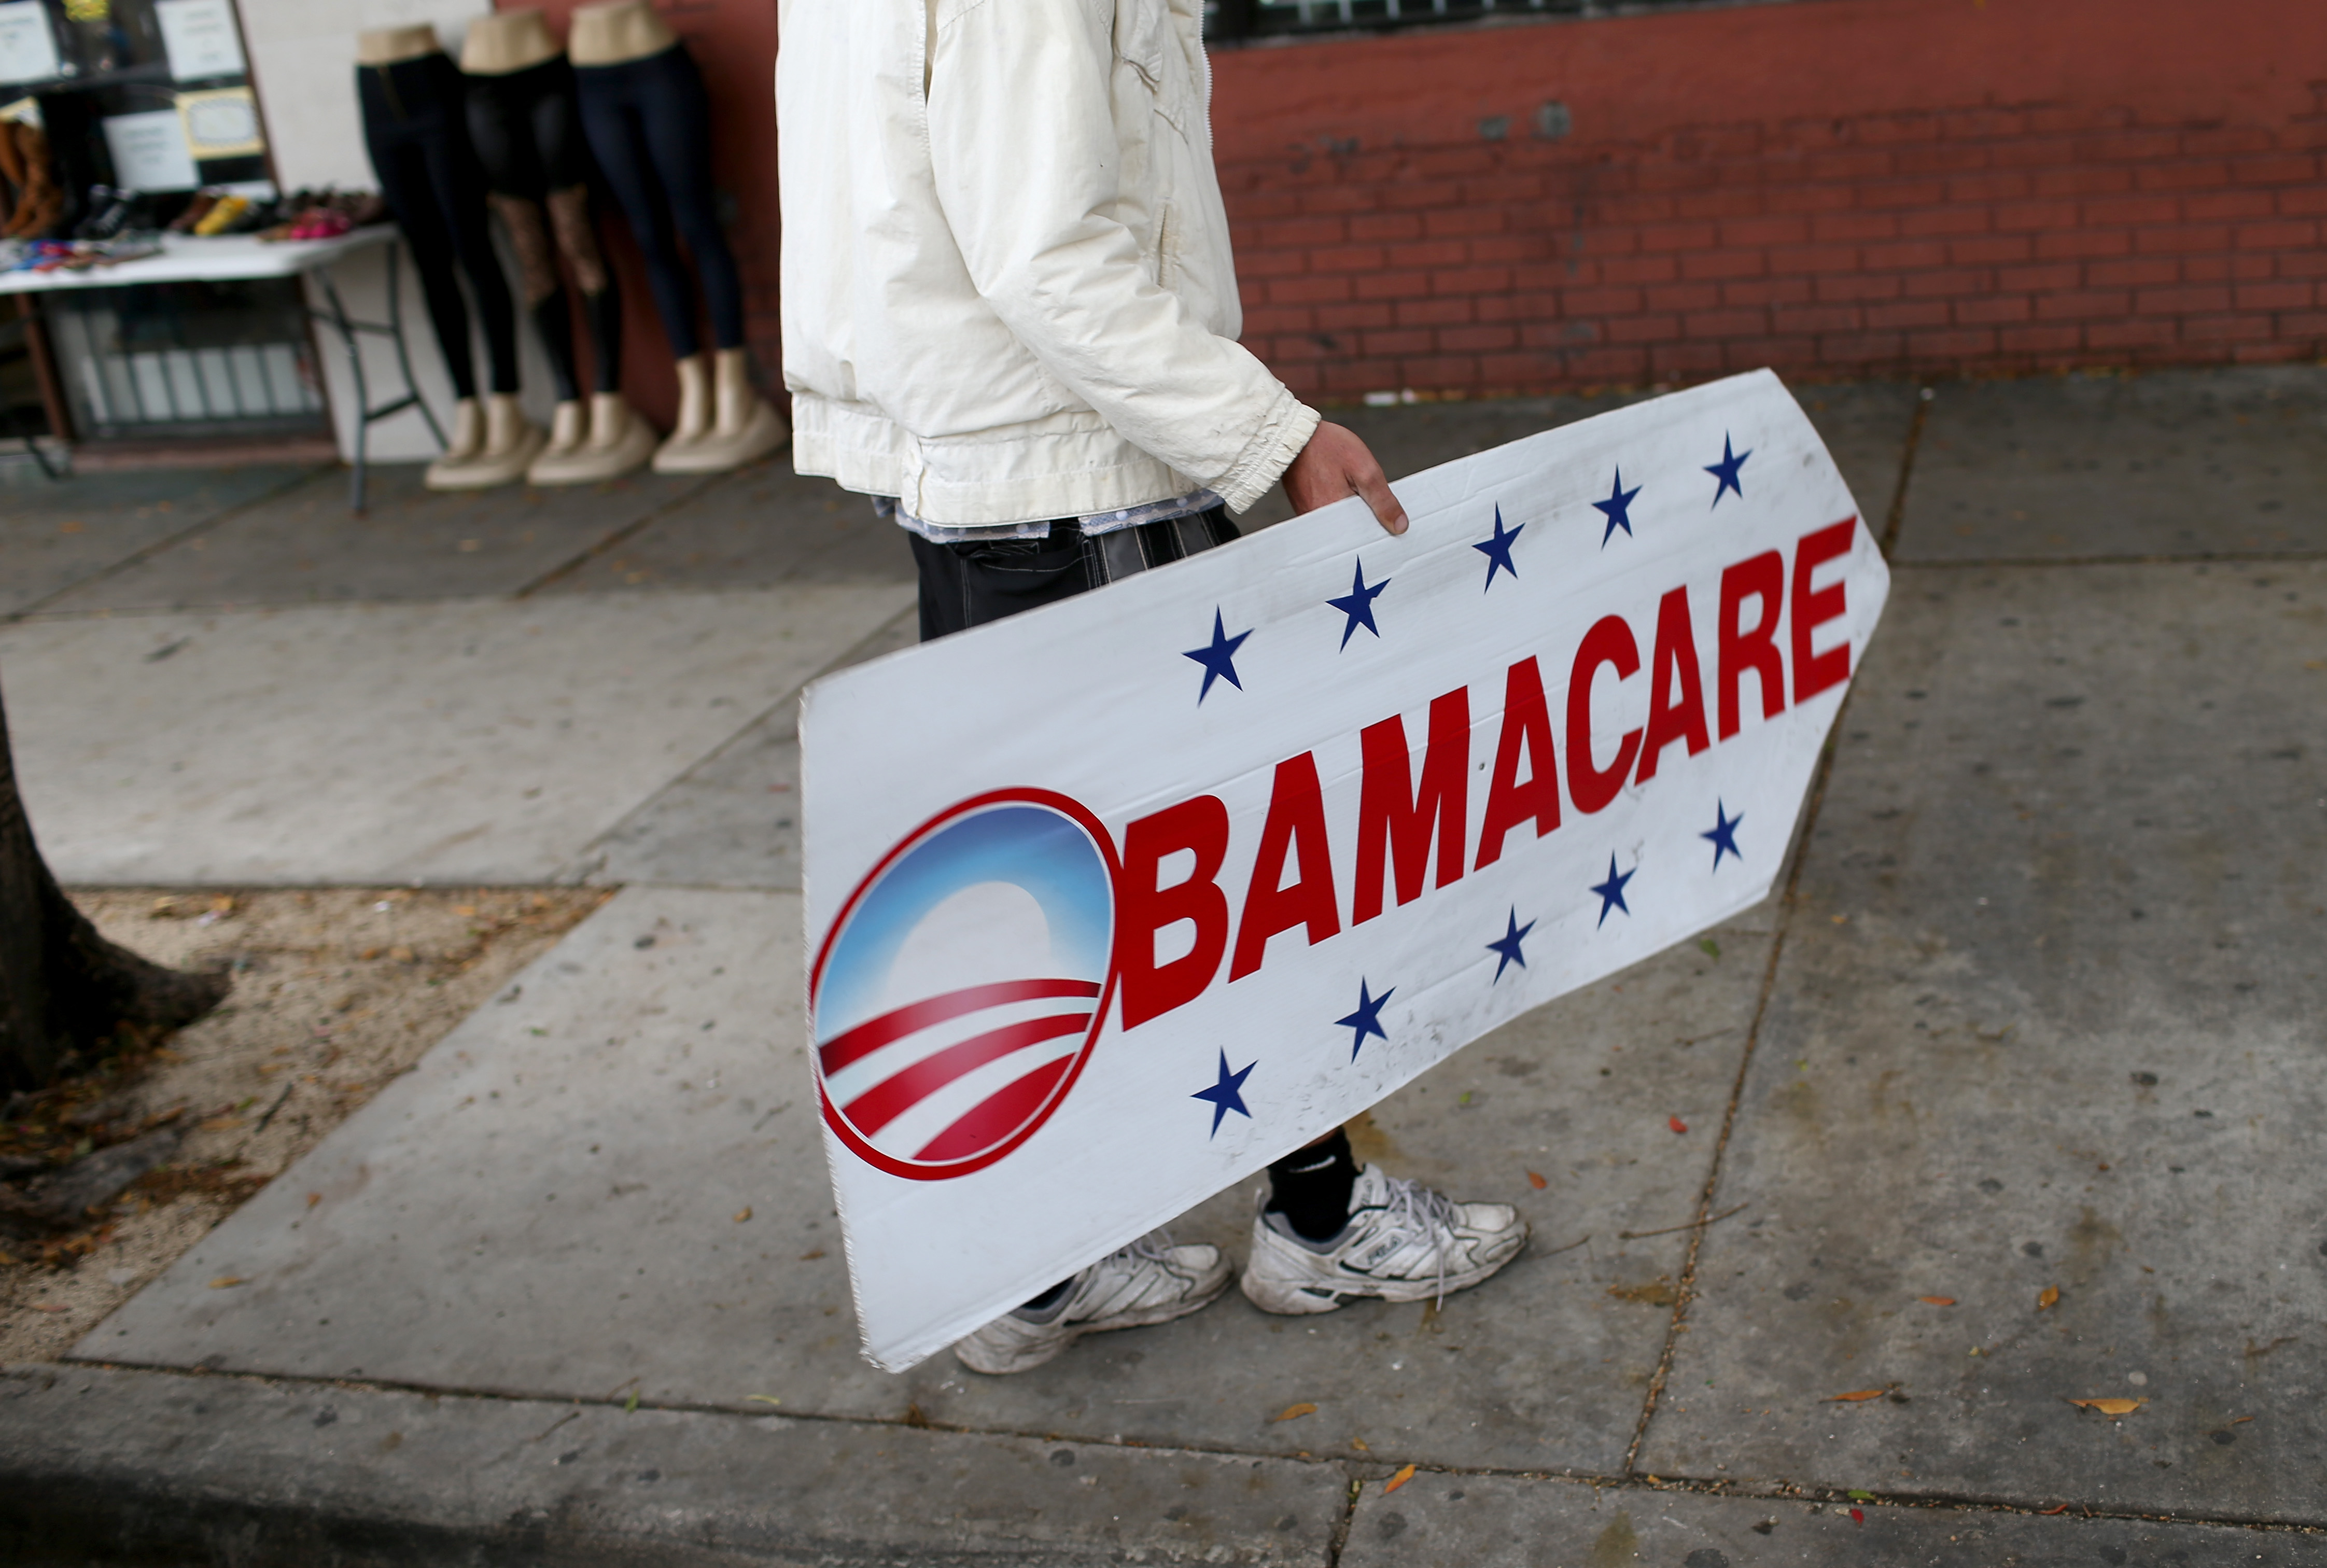 Supreme Court to Hear Case Involving Religious Freedom in Obamacare Dispute Over Birth Control